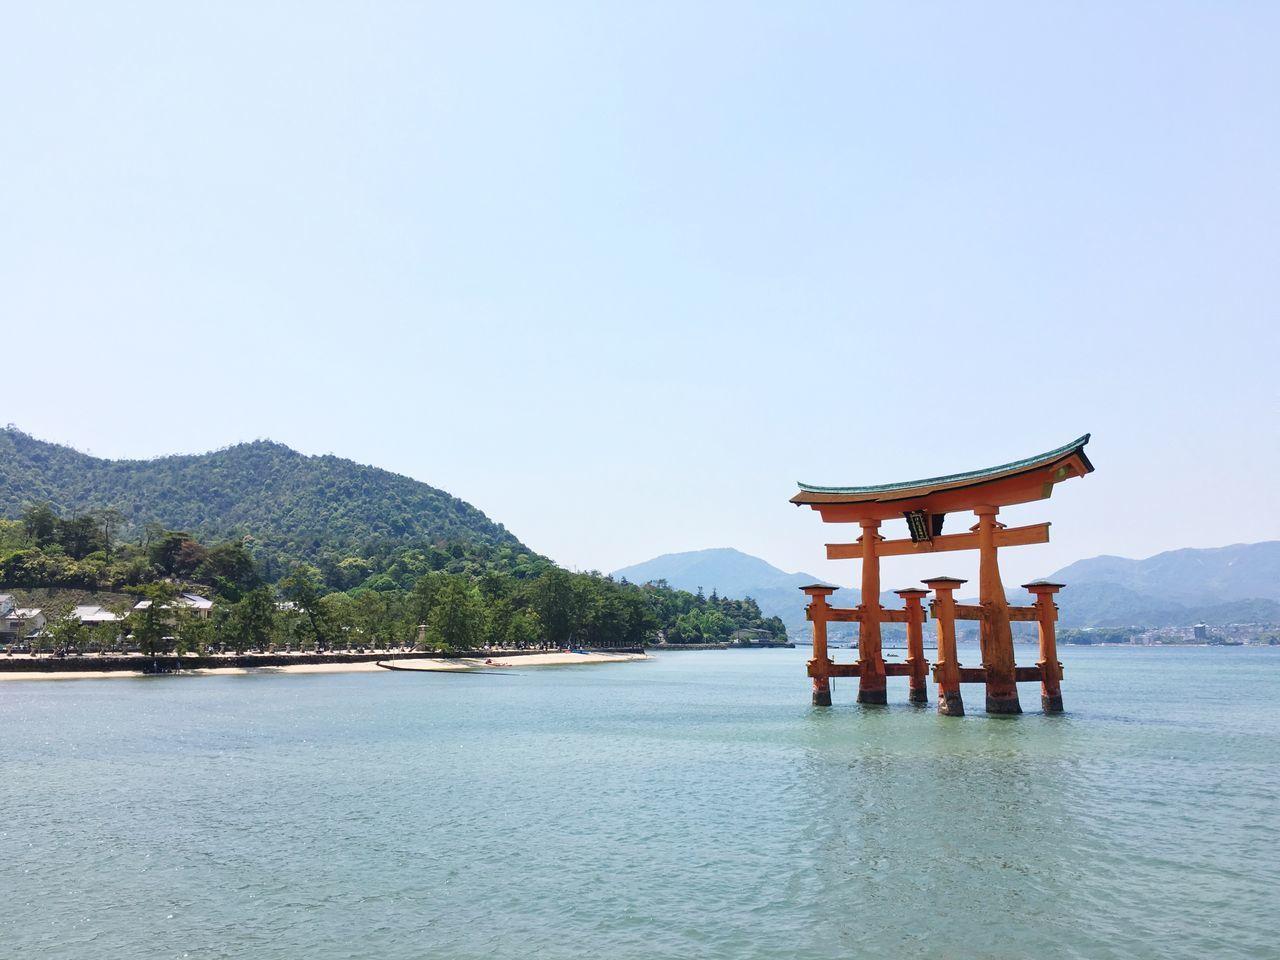 Water Built Structure Nature Architecture Beauty In Nature Tranquility Clear Sky Scenics Sea Day No People Travel Destinations Hiroshima Miyajima Torii Japanese Shrine Itsukushima Shrine Sea And Sky